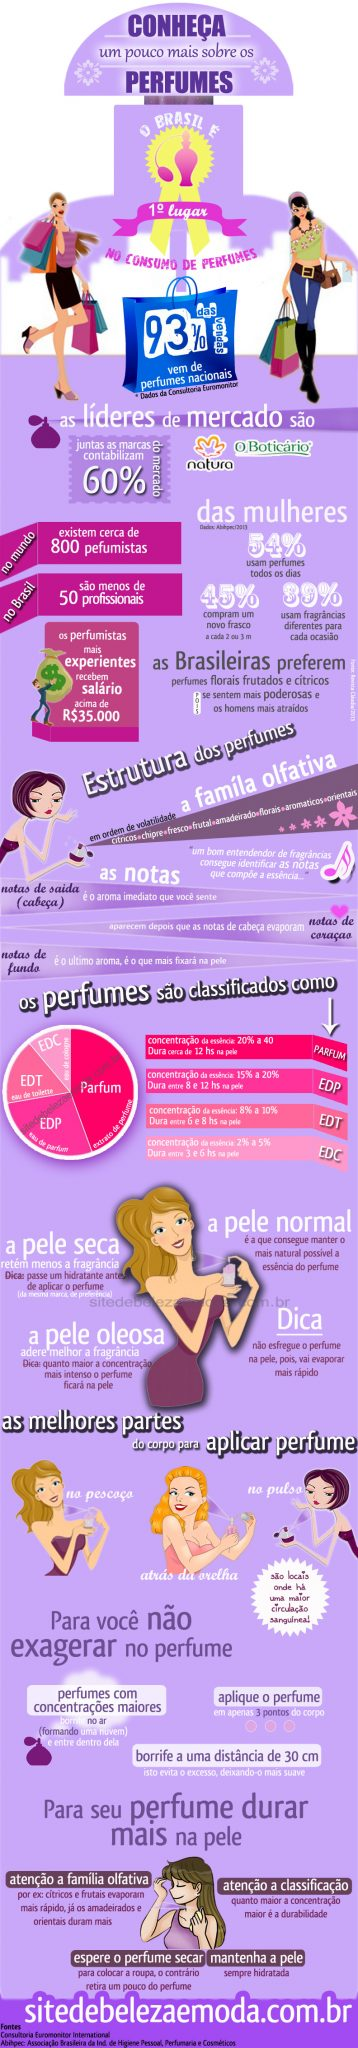 infográfico dos perfumes